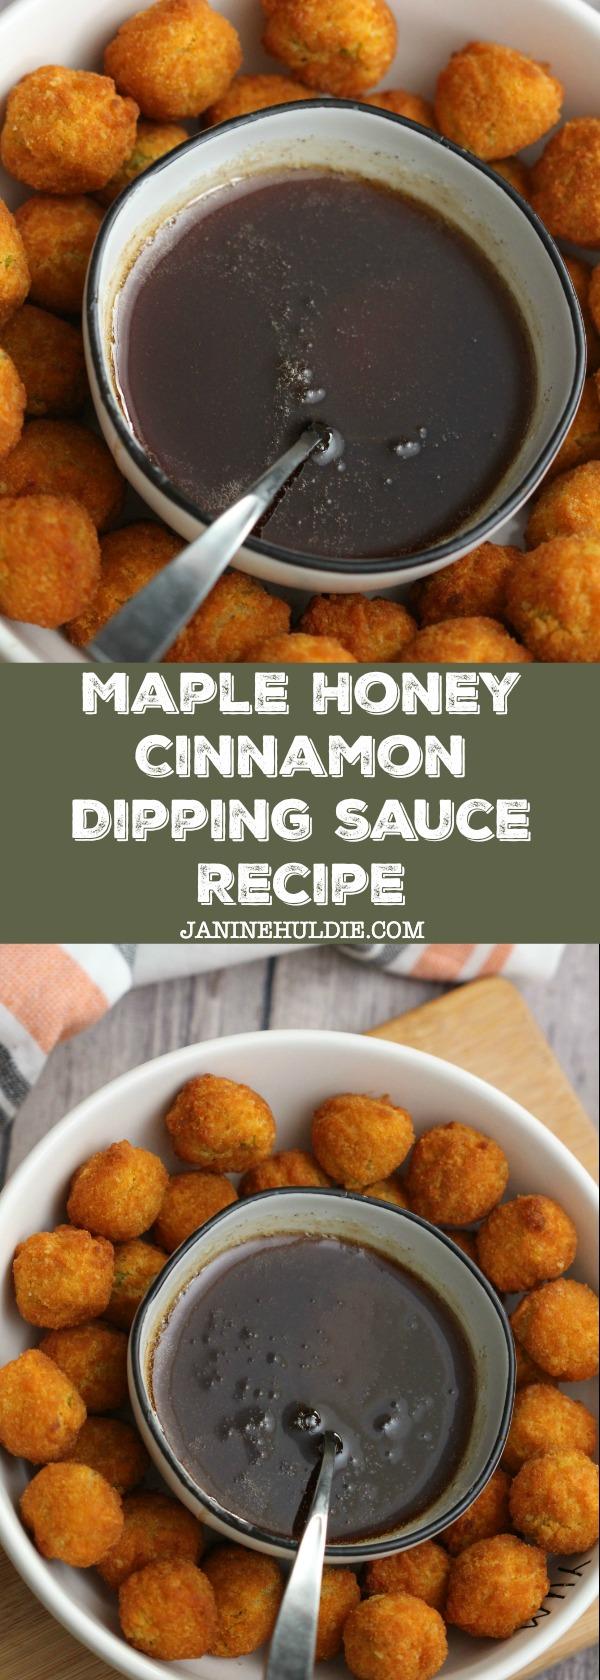 Maple Cinnamon Dipping Sauce Recipe